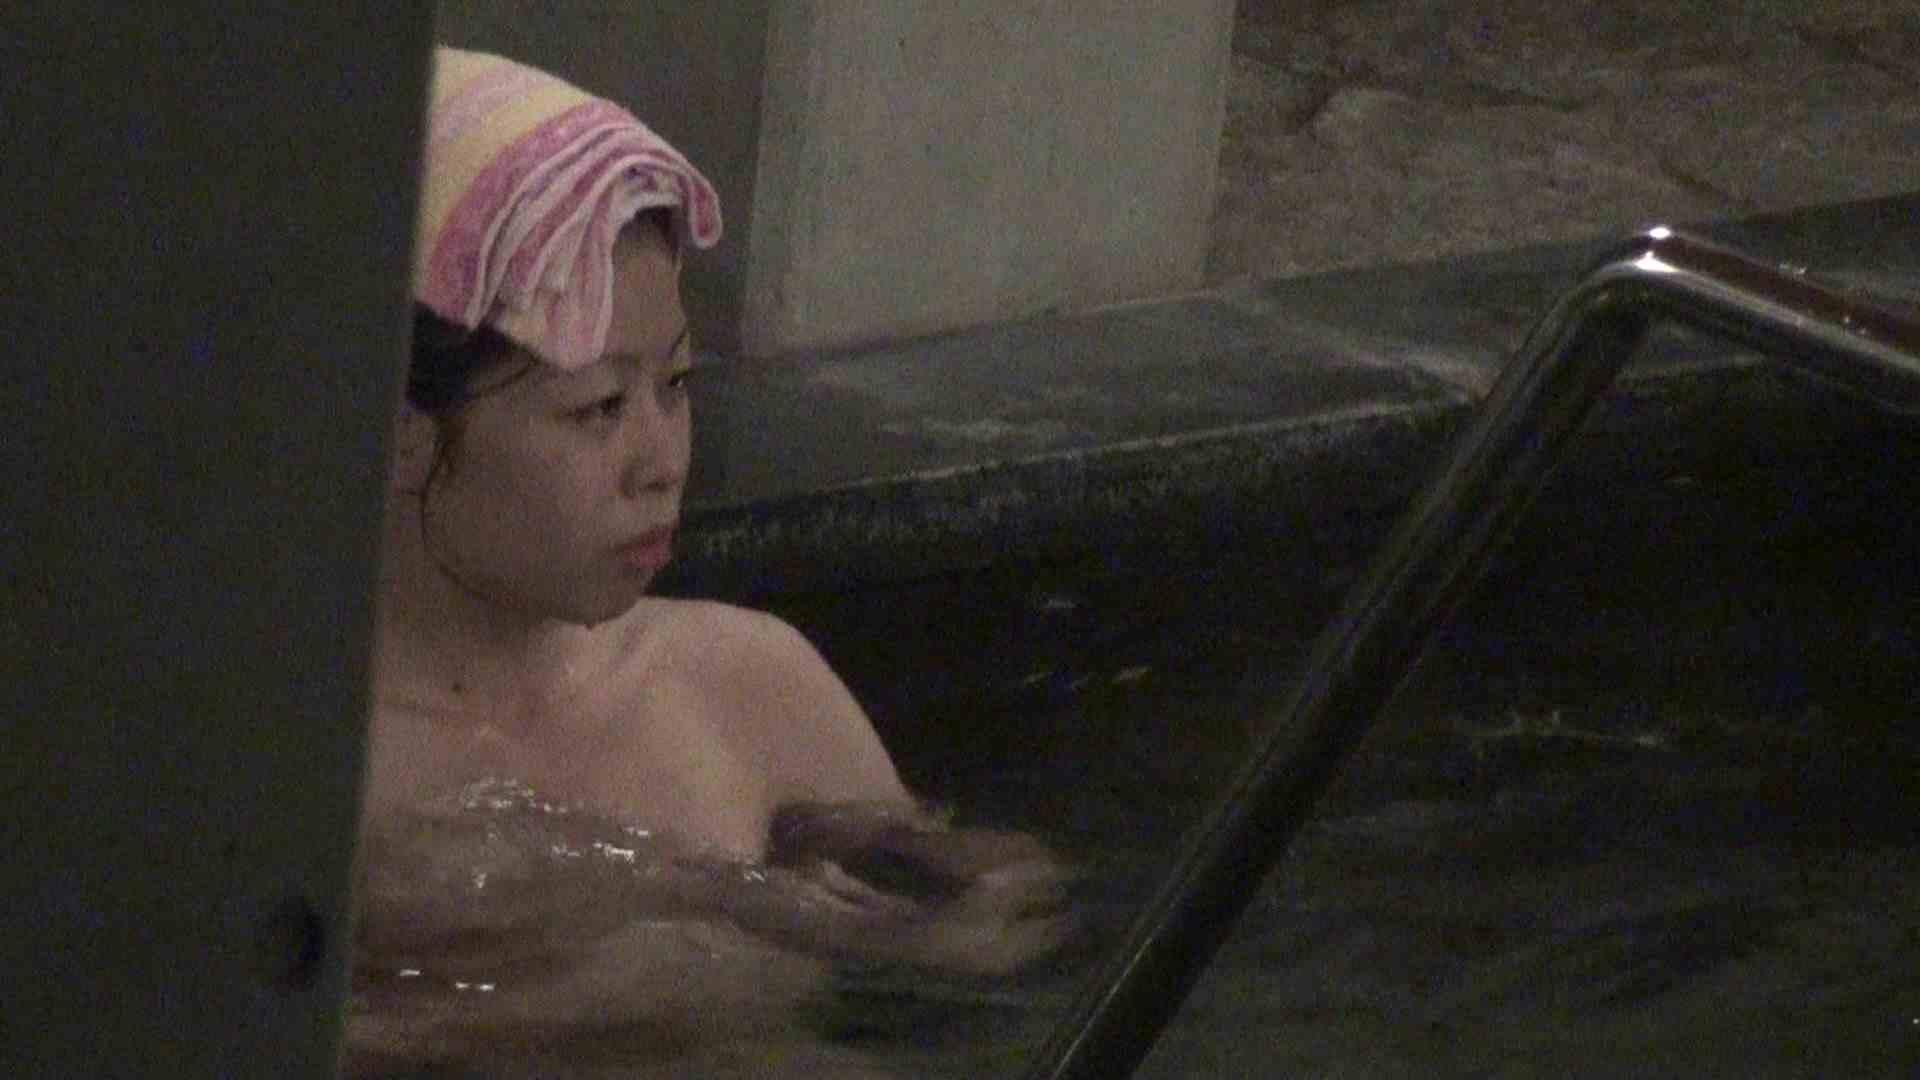 Aquaな露天風呂Vol.324 盗撮大放出 すけべAV動画紹介 52連発 39